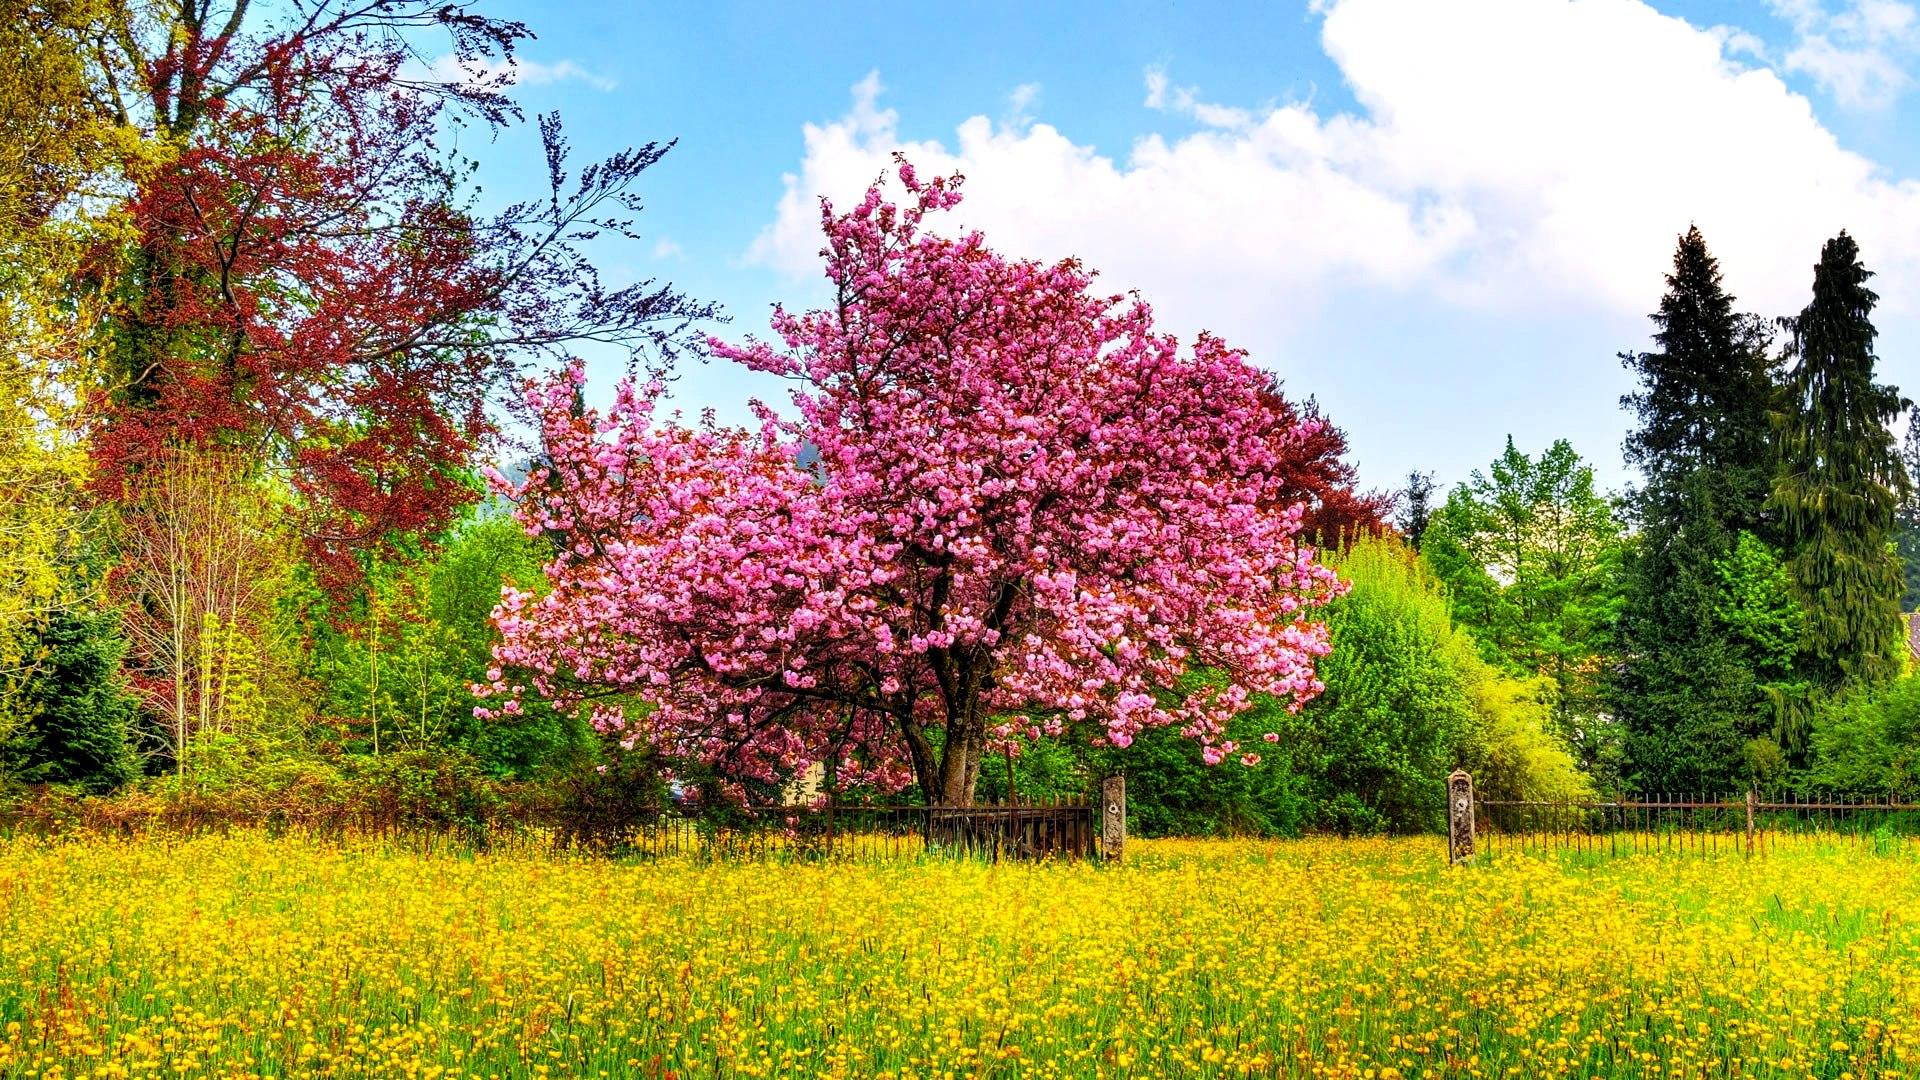 Free photo spring season single spring yellow free download spring season mightylinksfo